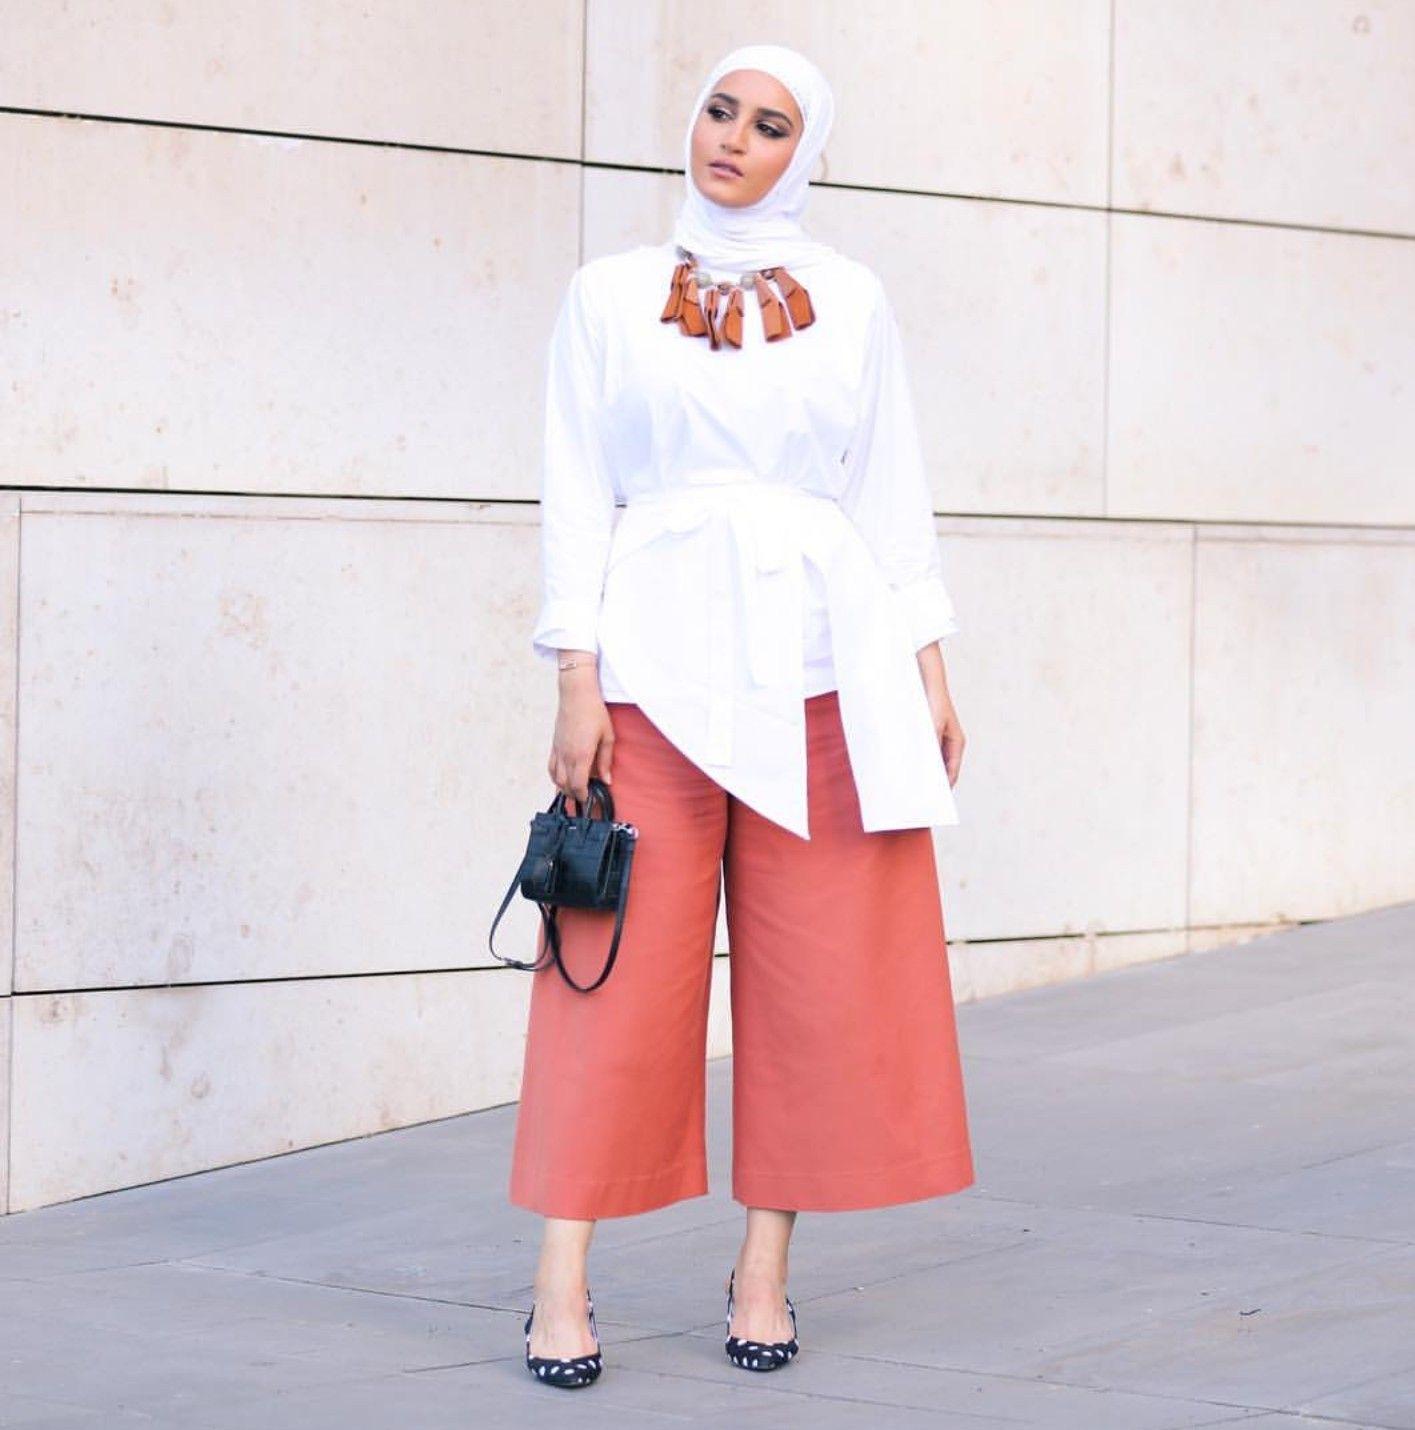 Pin By Tanaz Inamdar On Dalalid Hijabista Fashion Hijab Chic Hijab Fashion